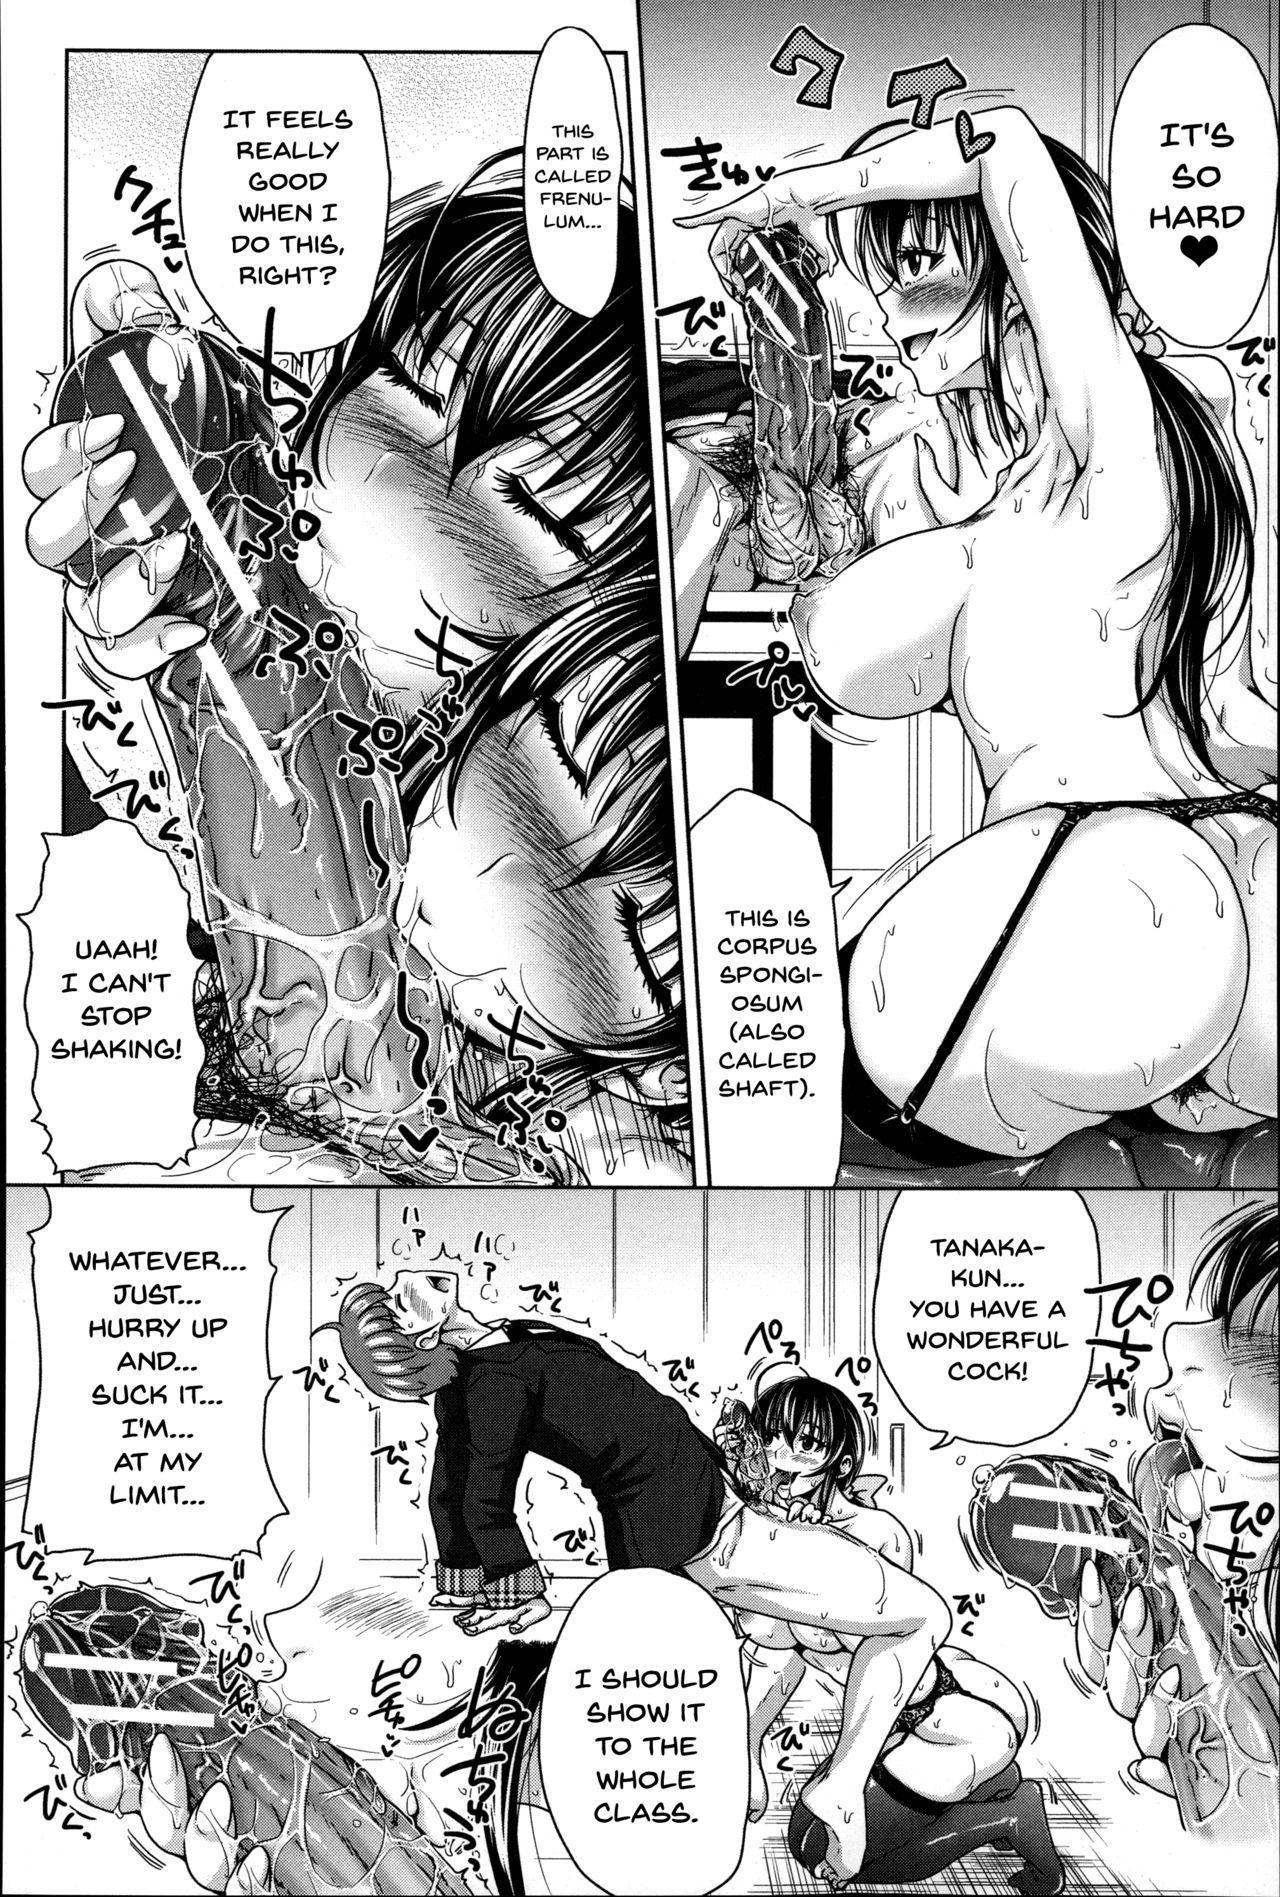 [Takuwan] Pakotate! Seikouritsu 0% no Teppeki Bishojo VS Seikouritsu 100% no Hentai Katei Kyoushi   Pakotate! Sex Rate 0% Iron-Willed Beautiful Virgins VS Sex Rate 100% Perverted Coach Ch.1-5 [English] {Doujins.com} 91